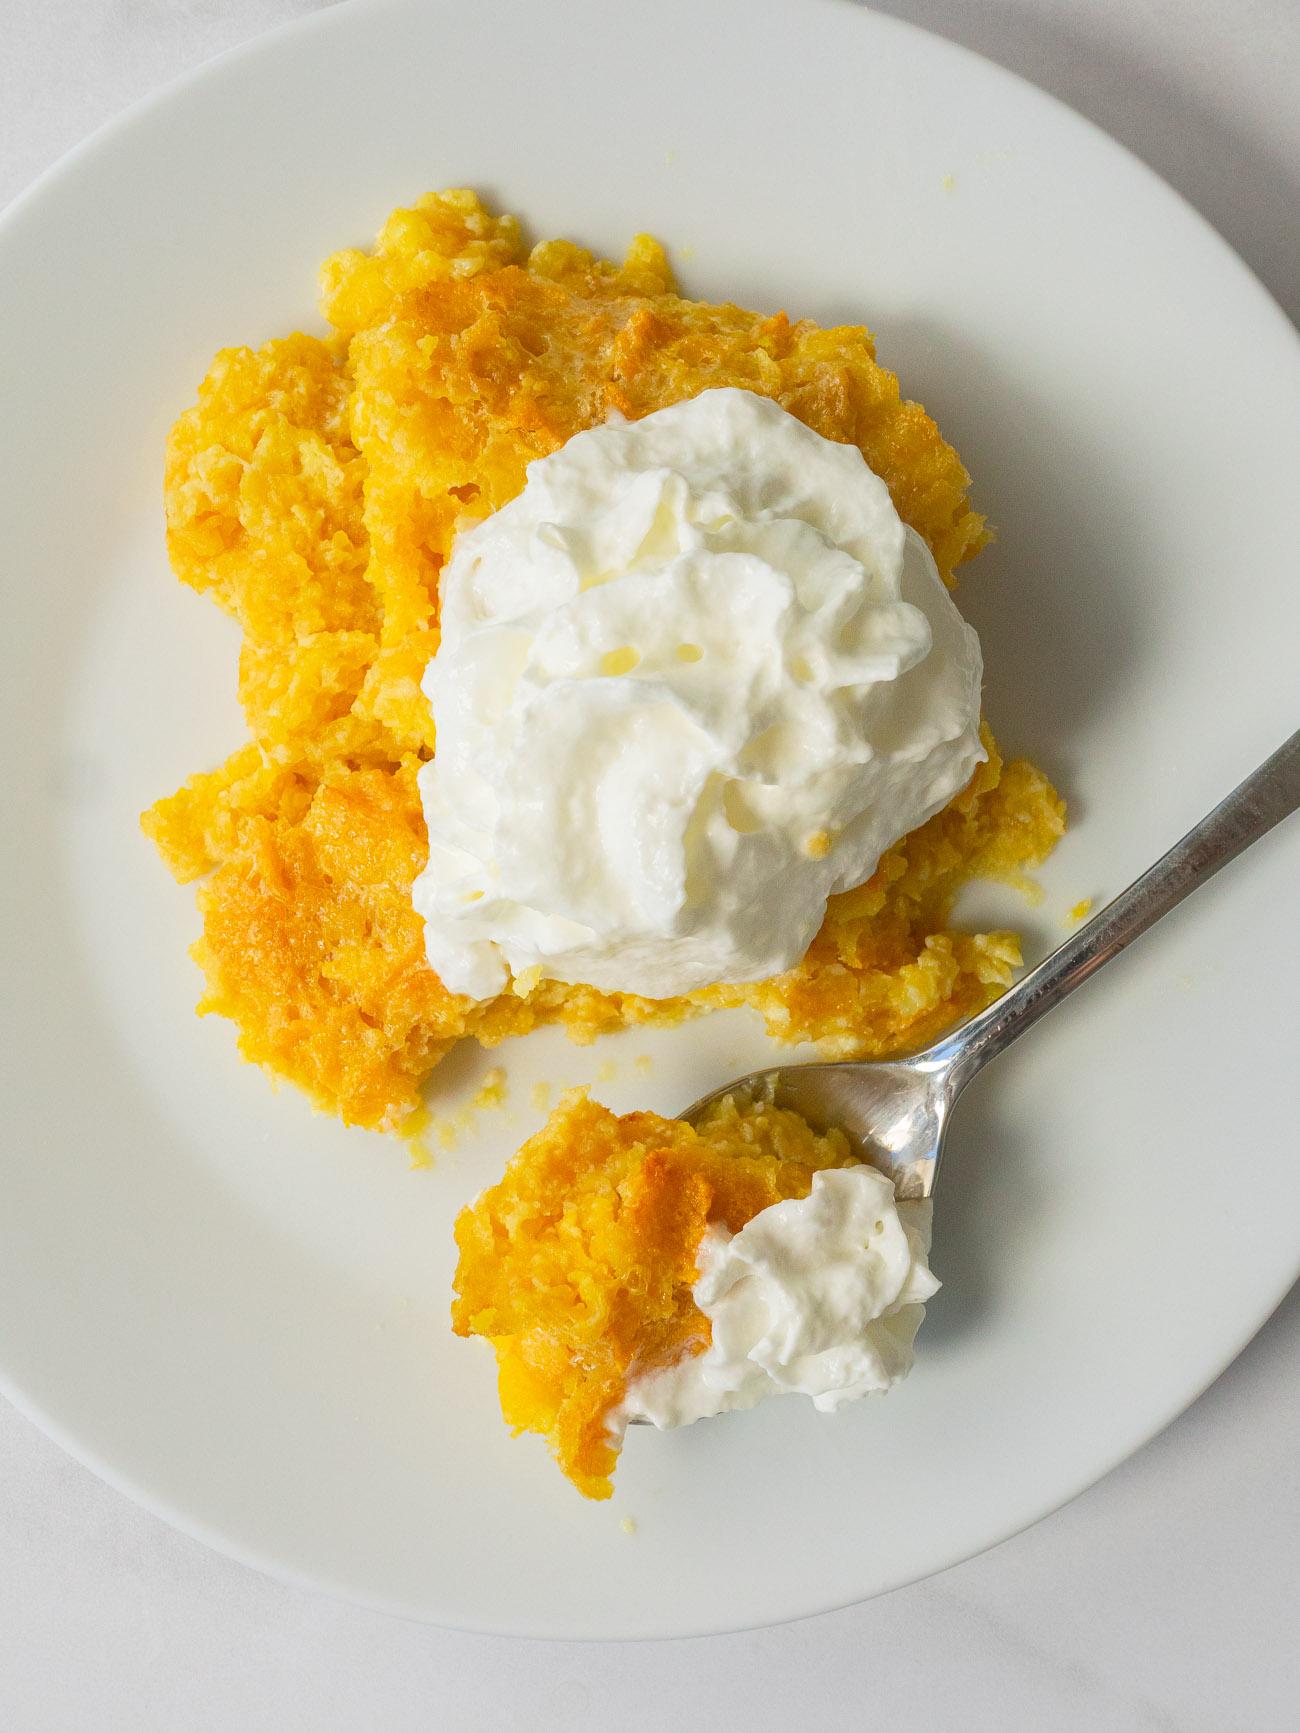 Grammie's Cornflake Pudding